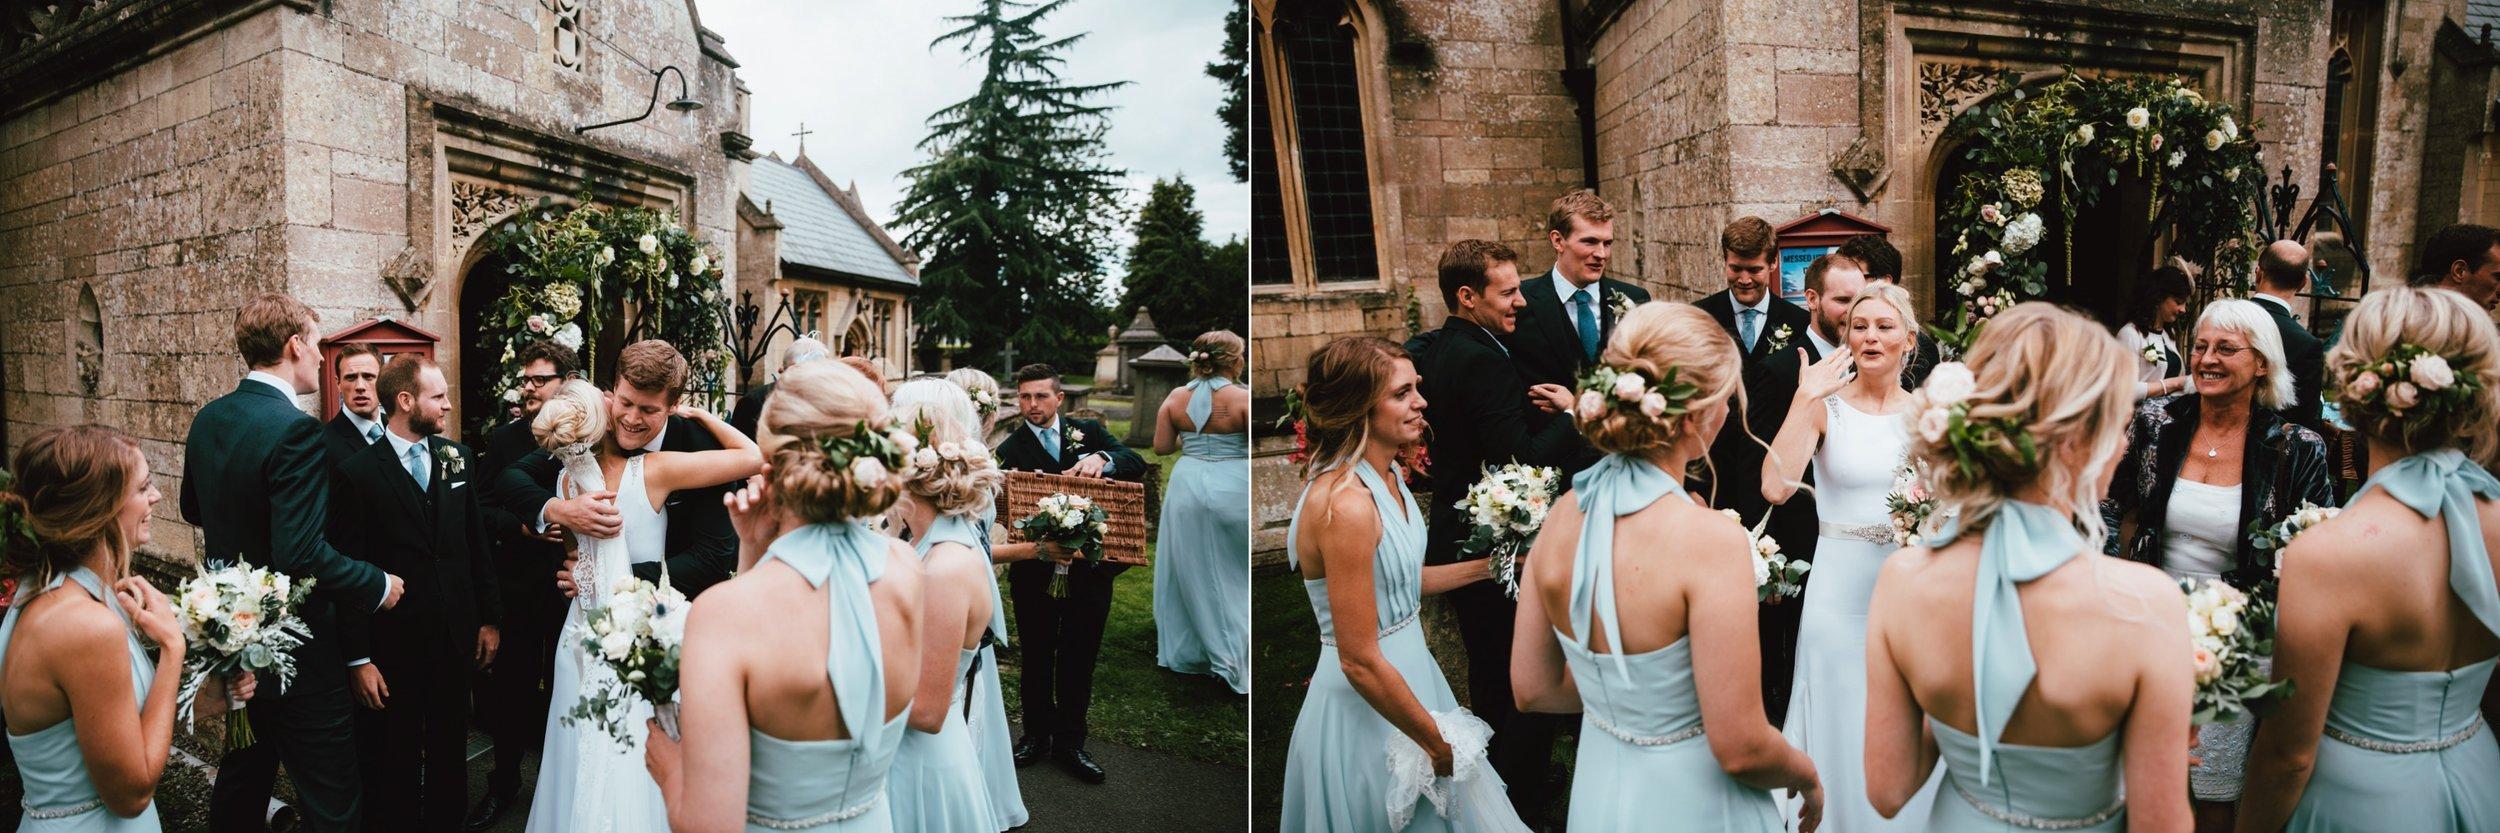 James & Hannah | Oak & Blossom0033.jpg